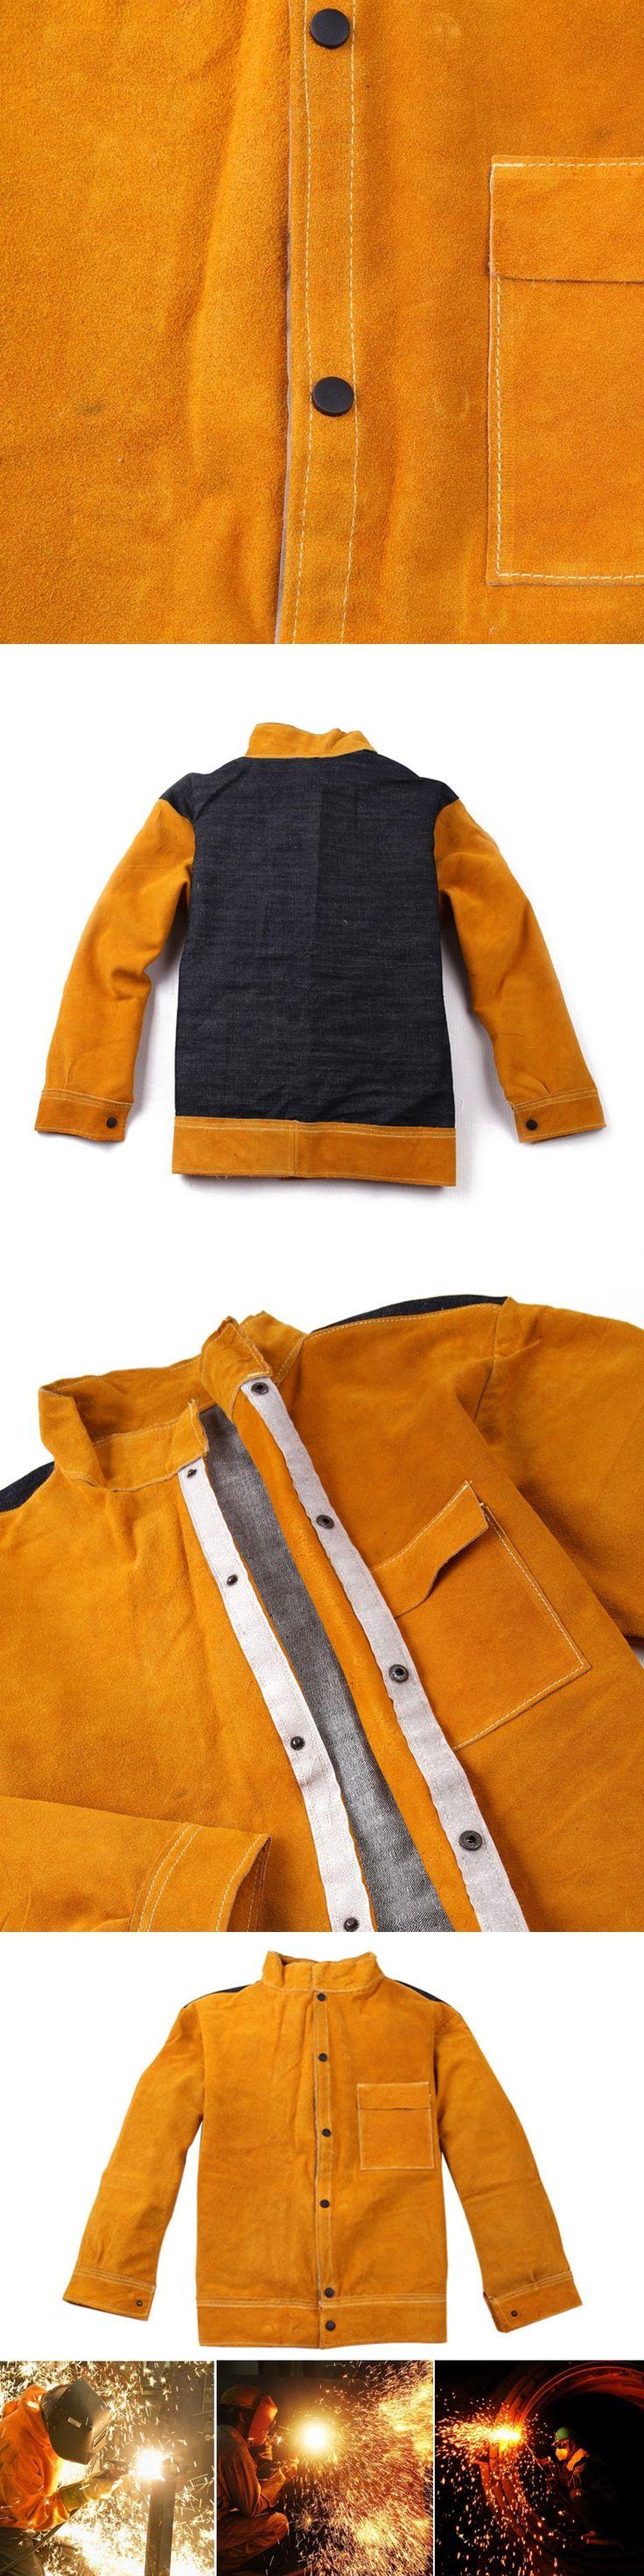 Best 25+ Welding jackets ideas on Pinterest | Miller mig welder ...